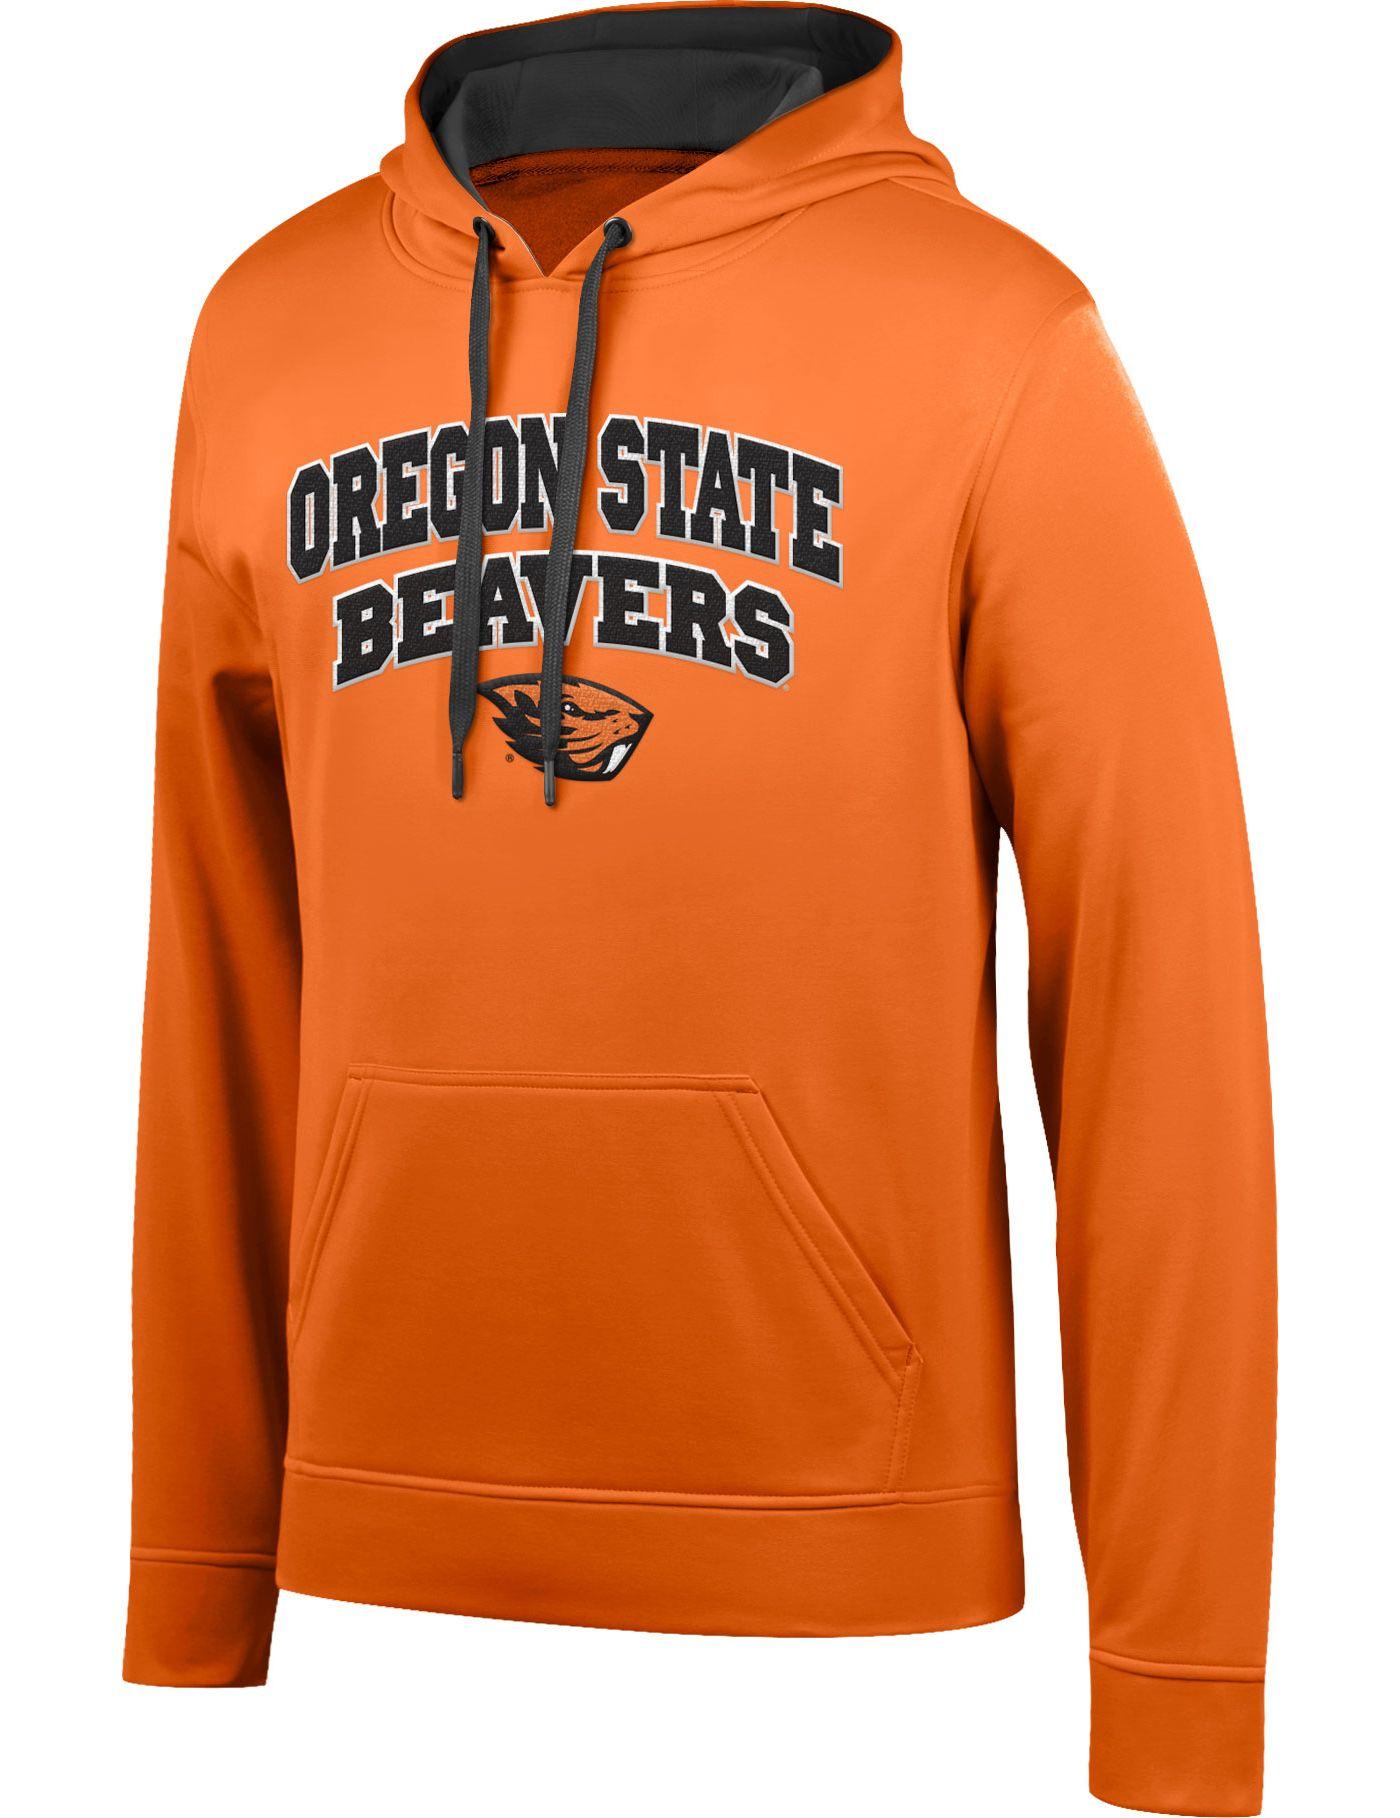 Top of the World Men's Oregon State Beavers Orange Foundation Hoodie